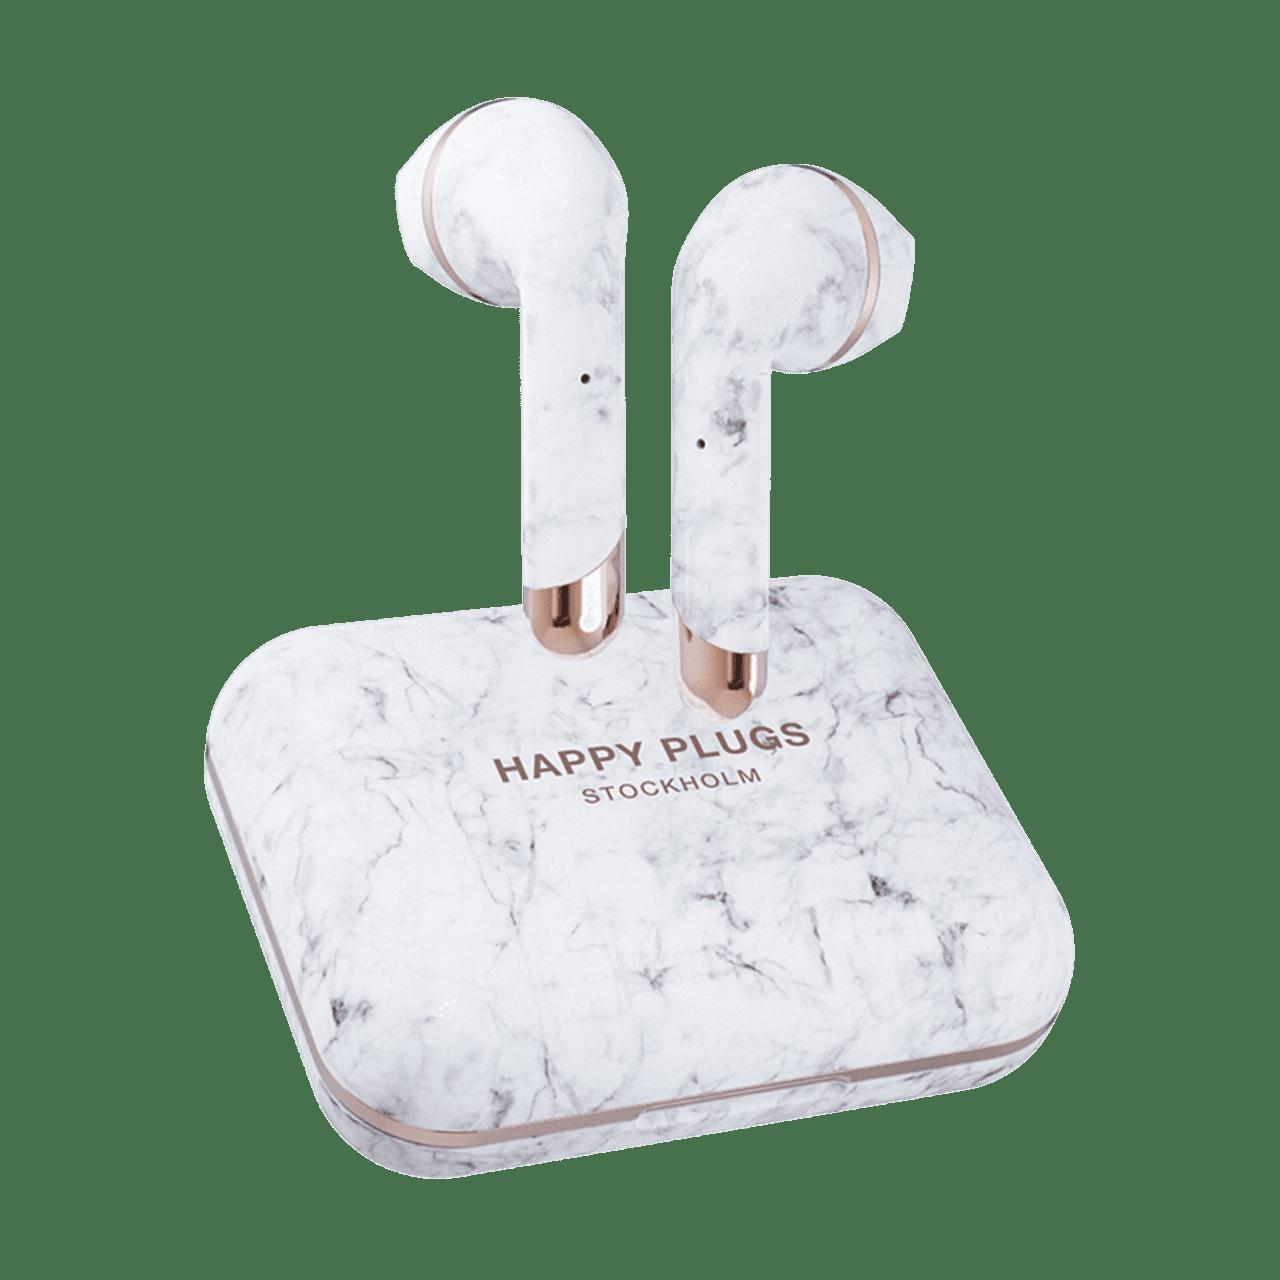 Happy Plugs Air1 Plus White Marble Earbud True Wireless Bluetooth Earphones - 1